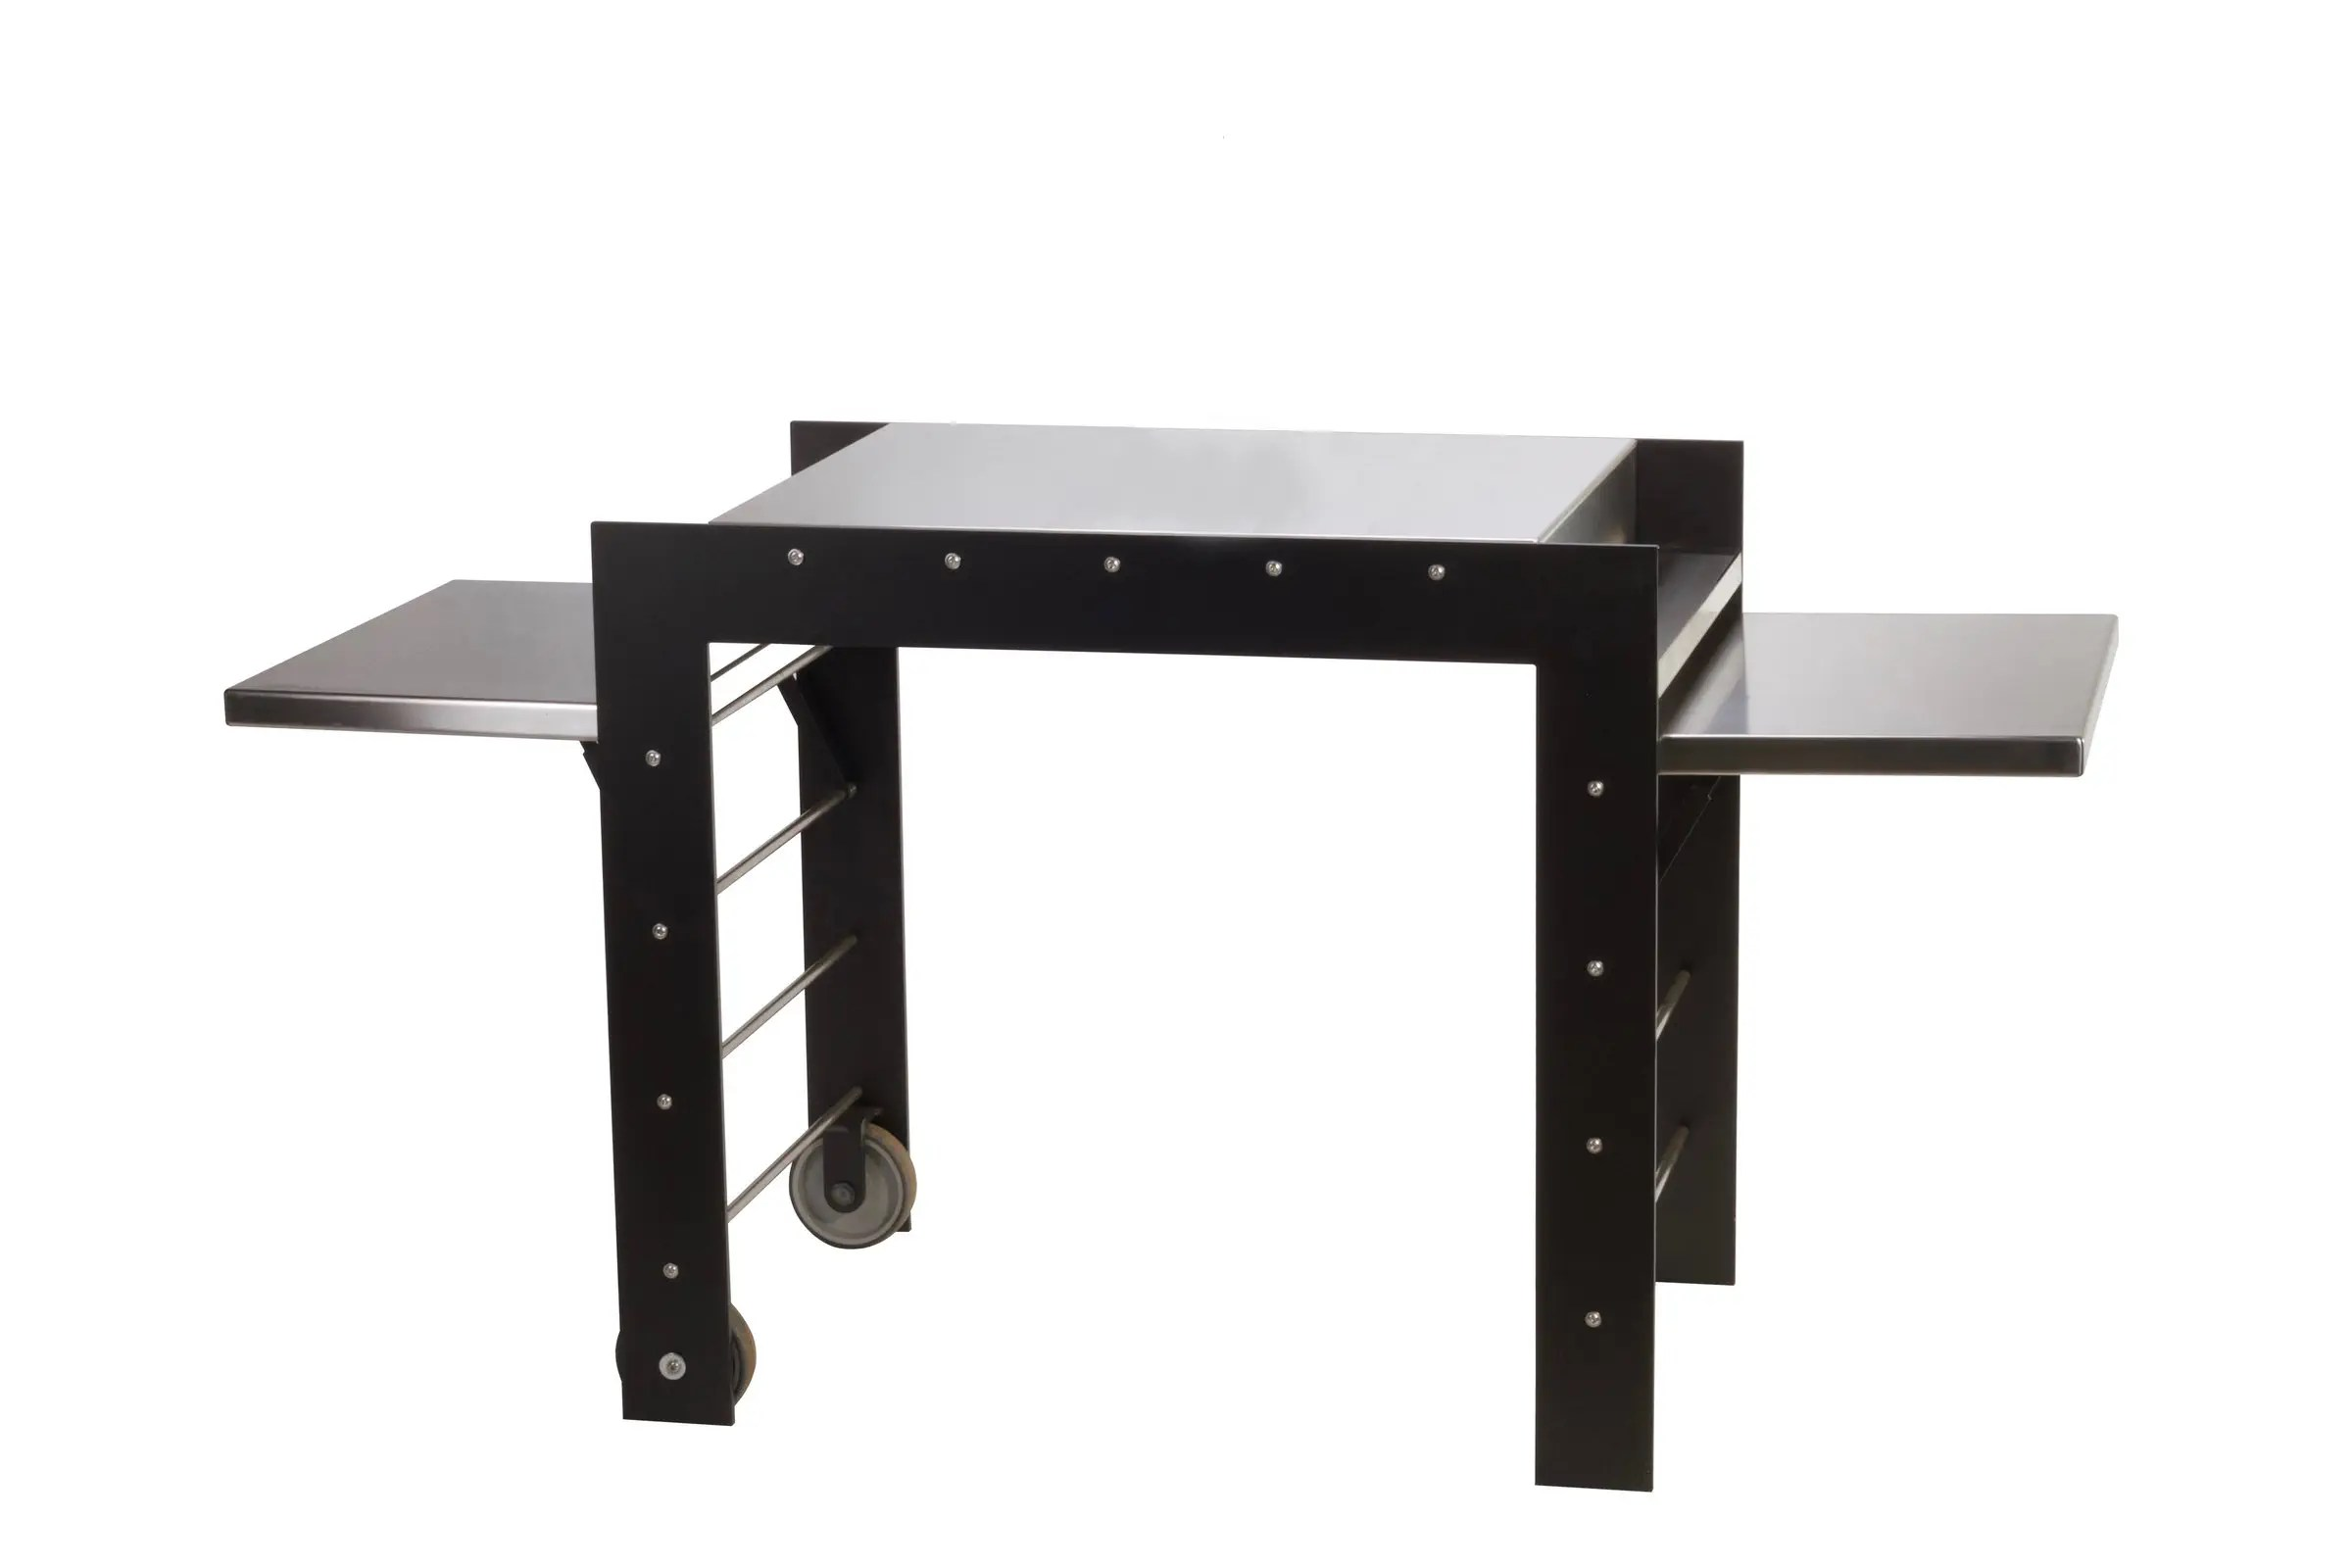 Outdoorküche Edelstahl Xxl : Modulare outdoor küche edelstahl modulare küche